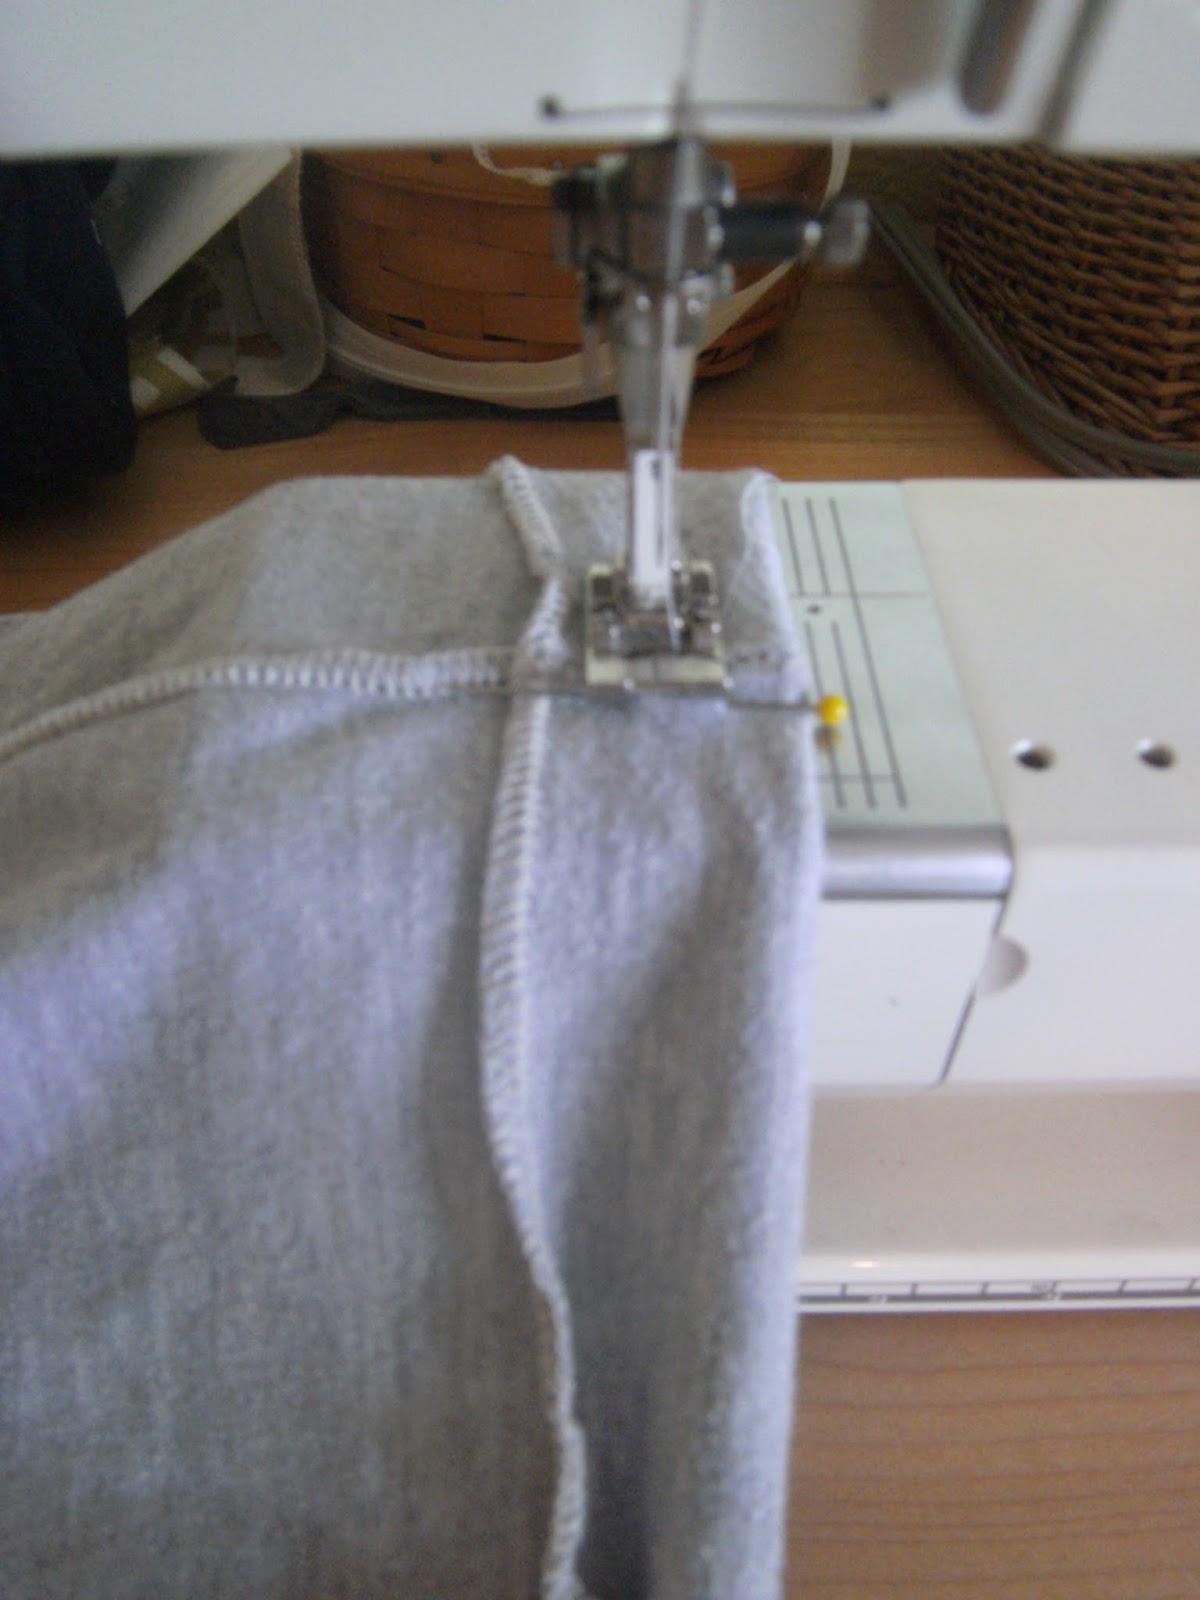 how to cut leggings to make them shorter